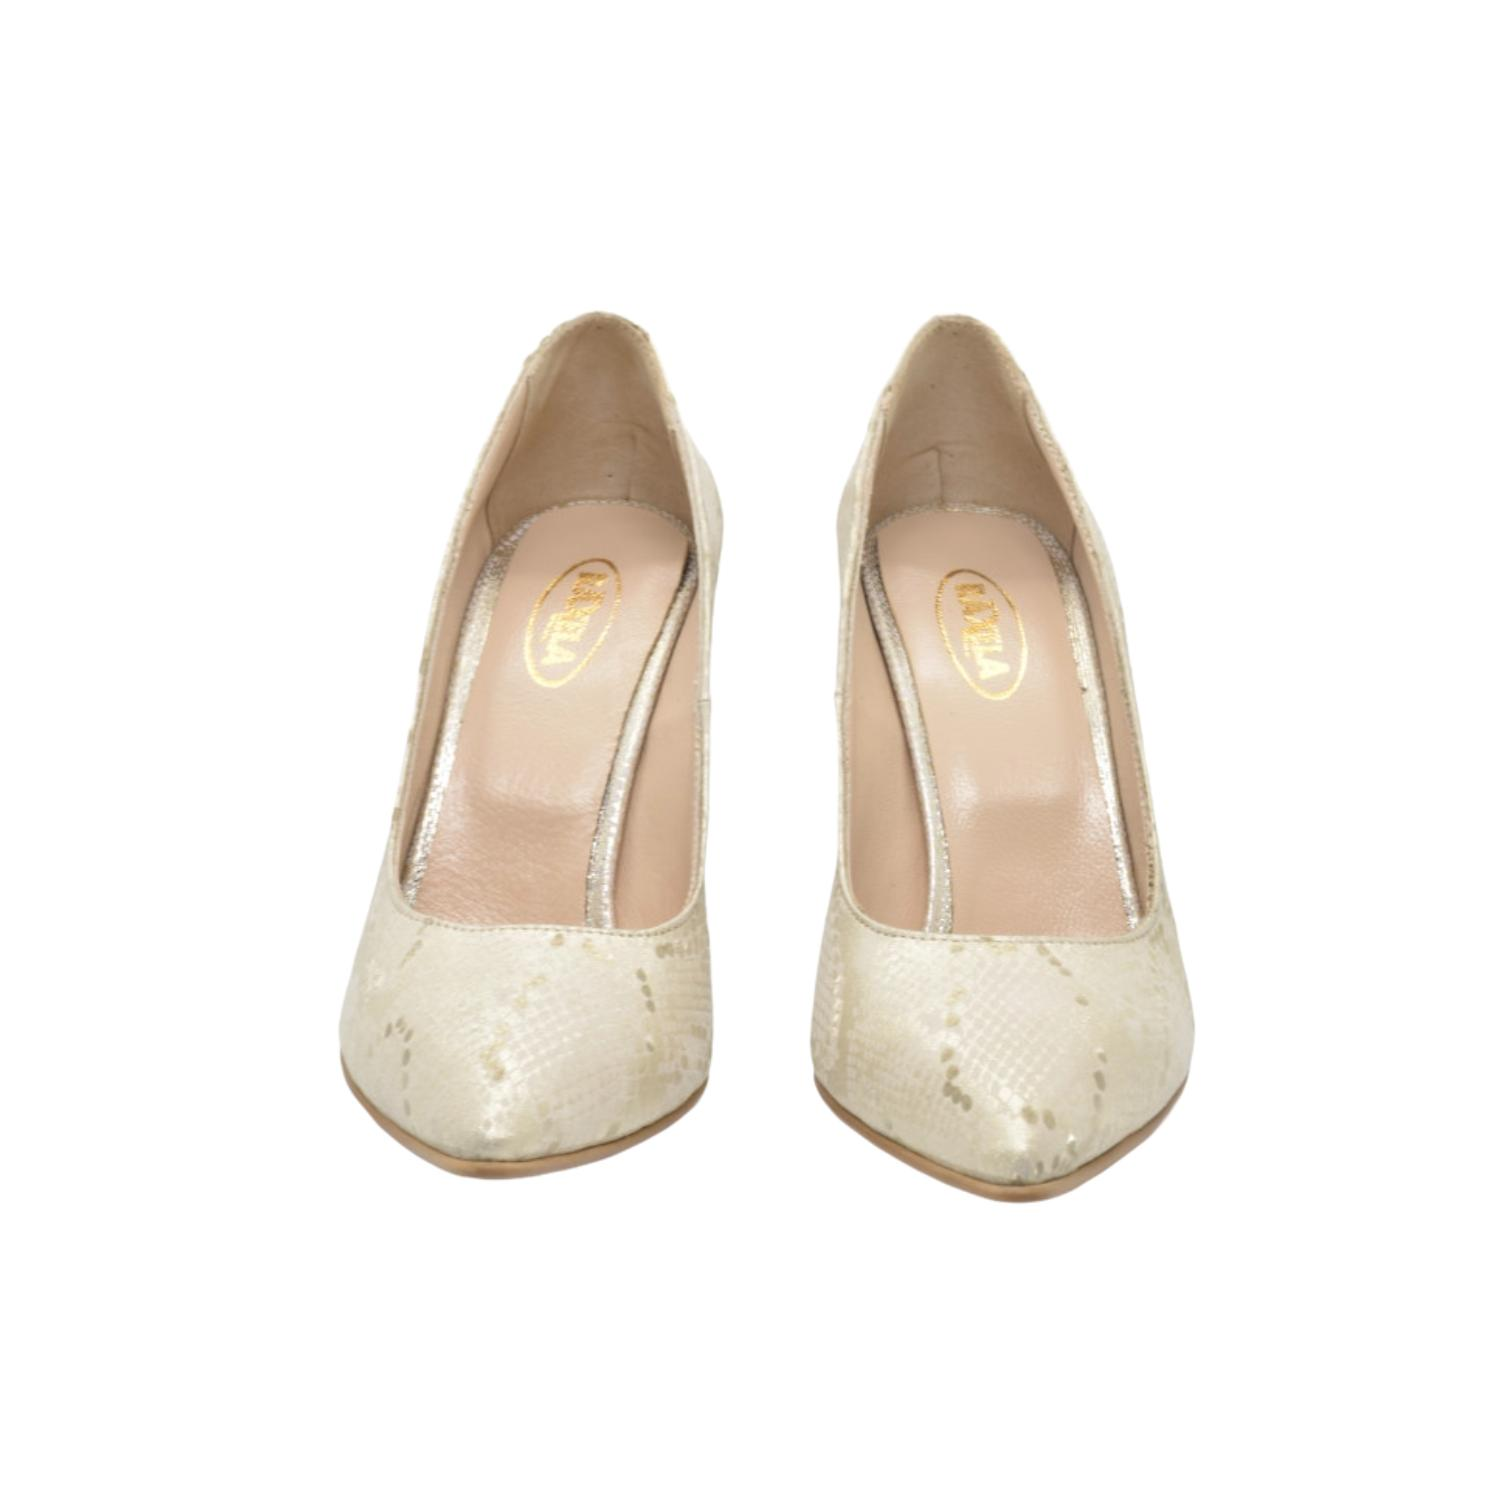 Pantofi bej cu imprimeu auriu